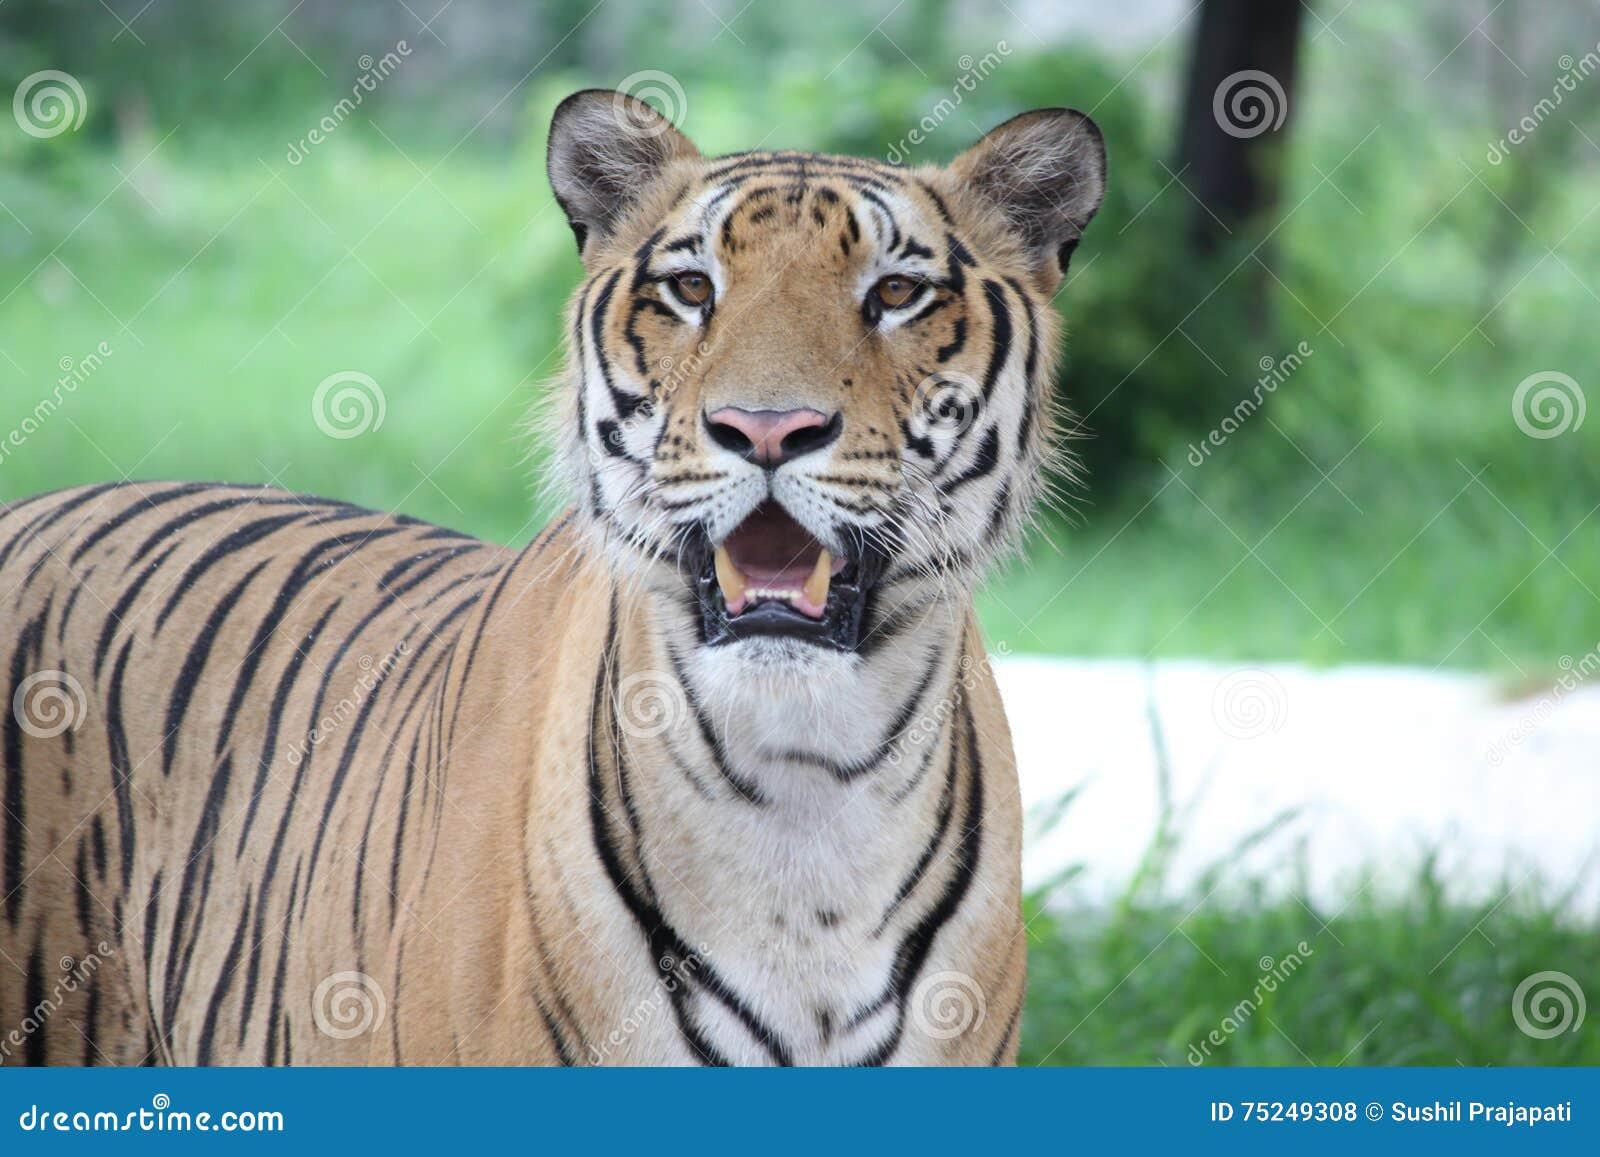 Tiger Royal Bengal